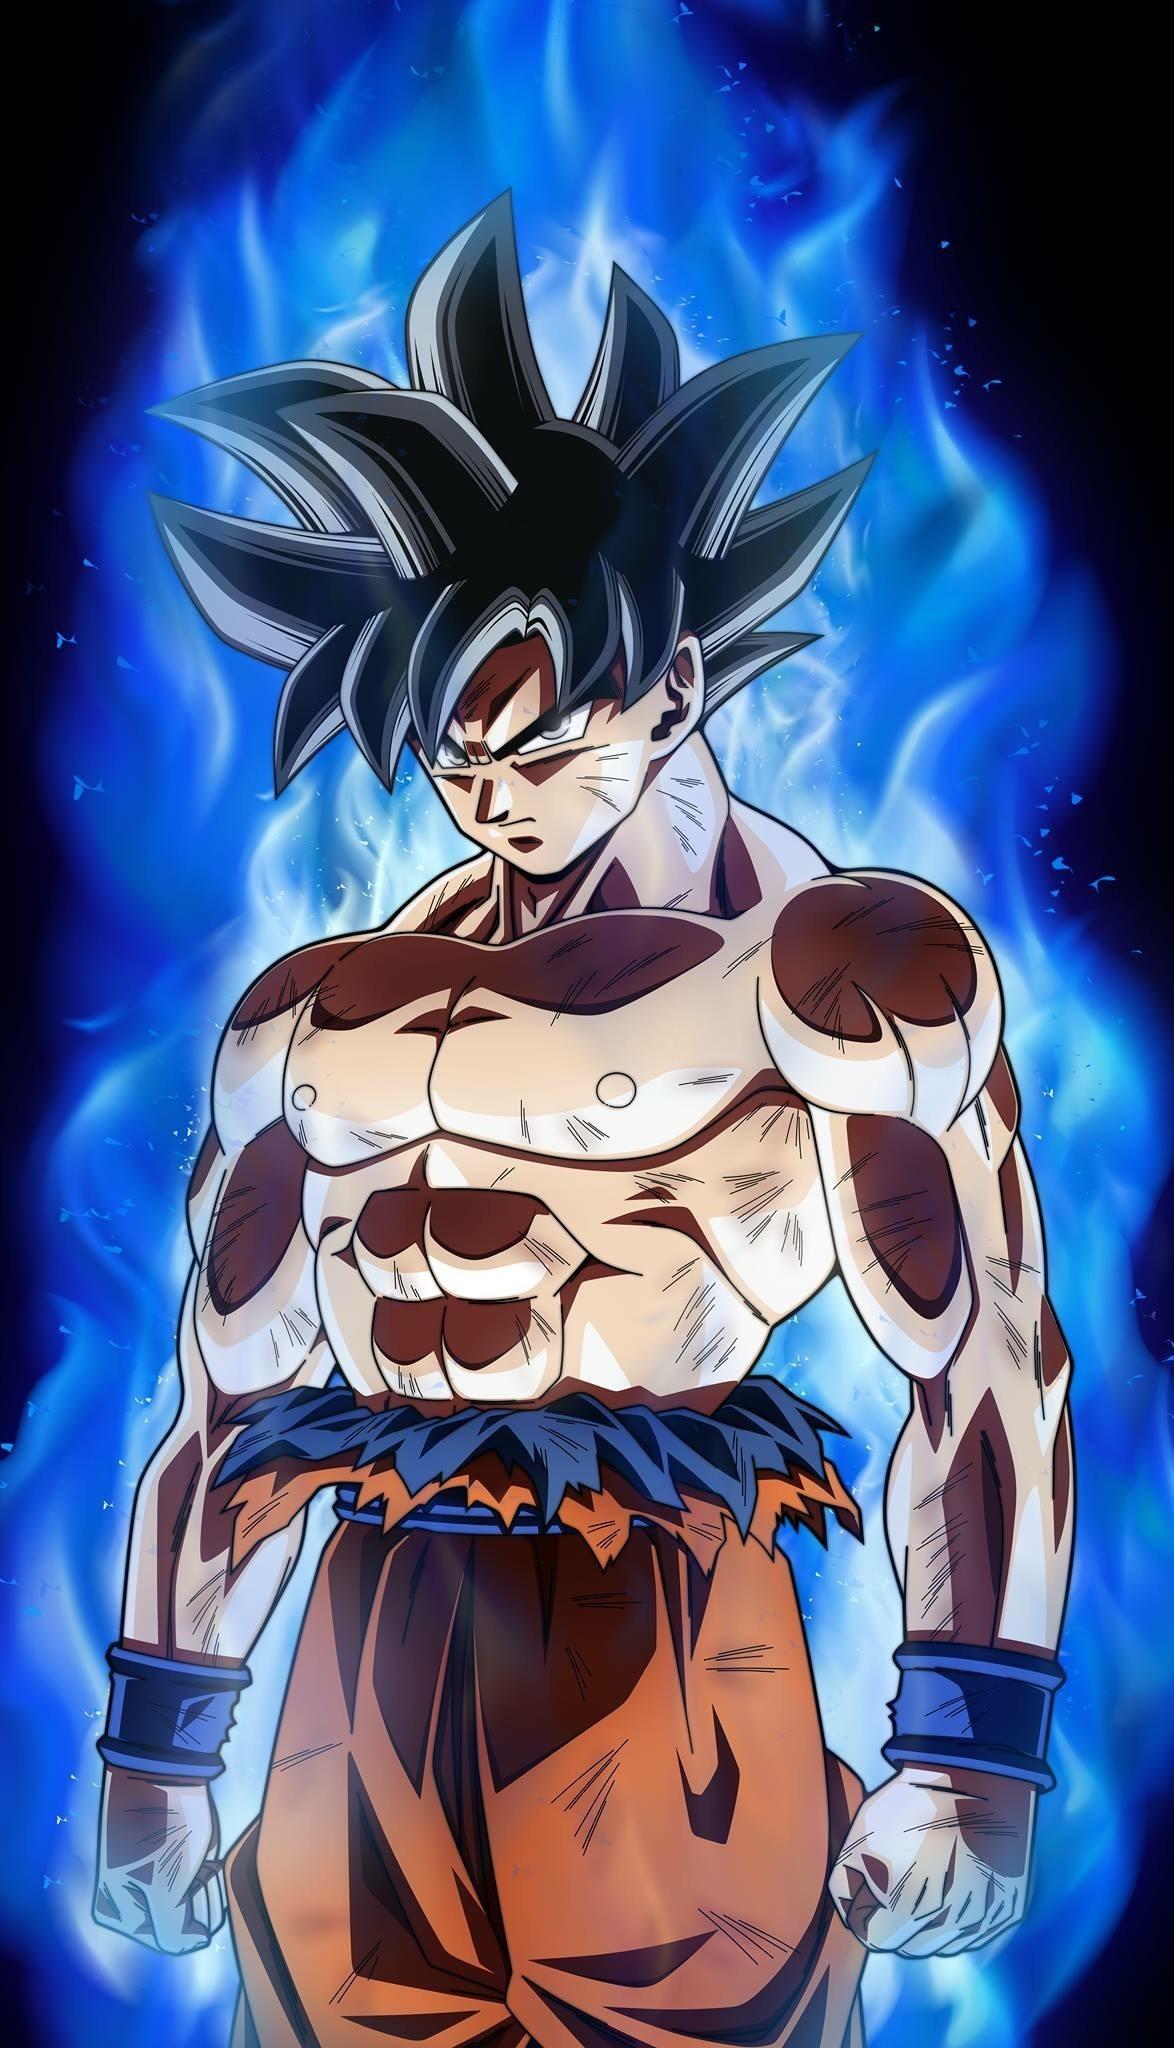 Res: 1174x2048, 1415x2000 Goku New Form Wallpaper For iPhone - Best Wallpaper HD